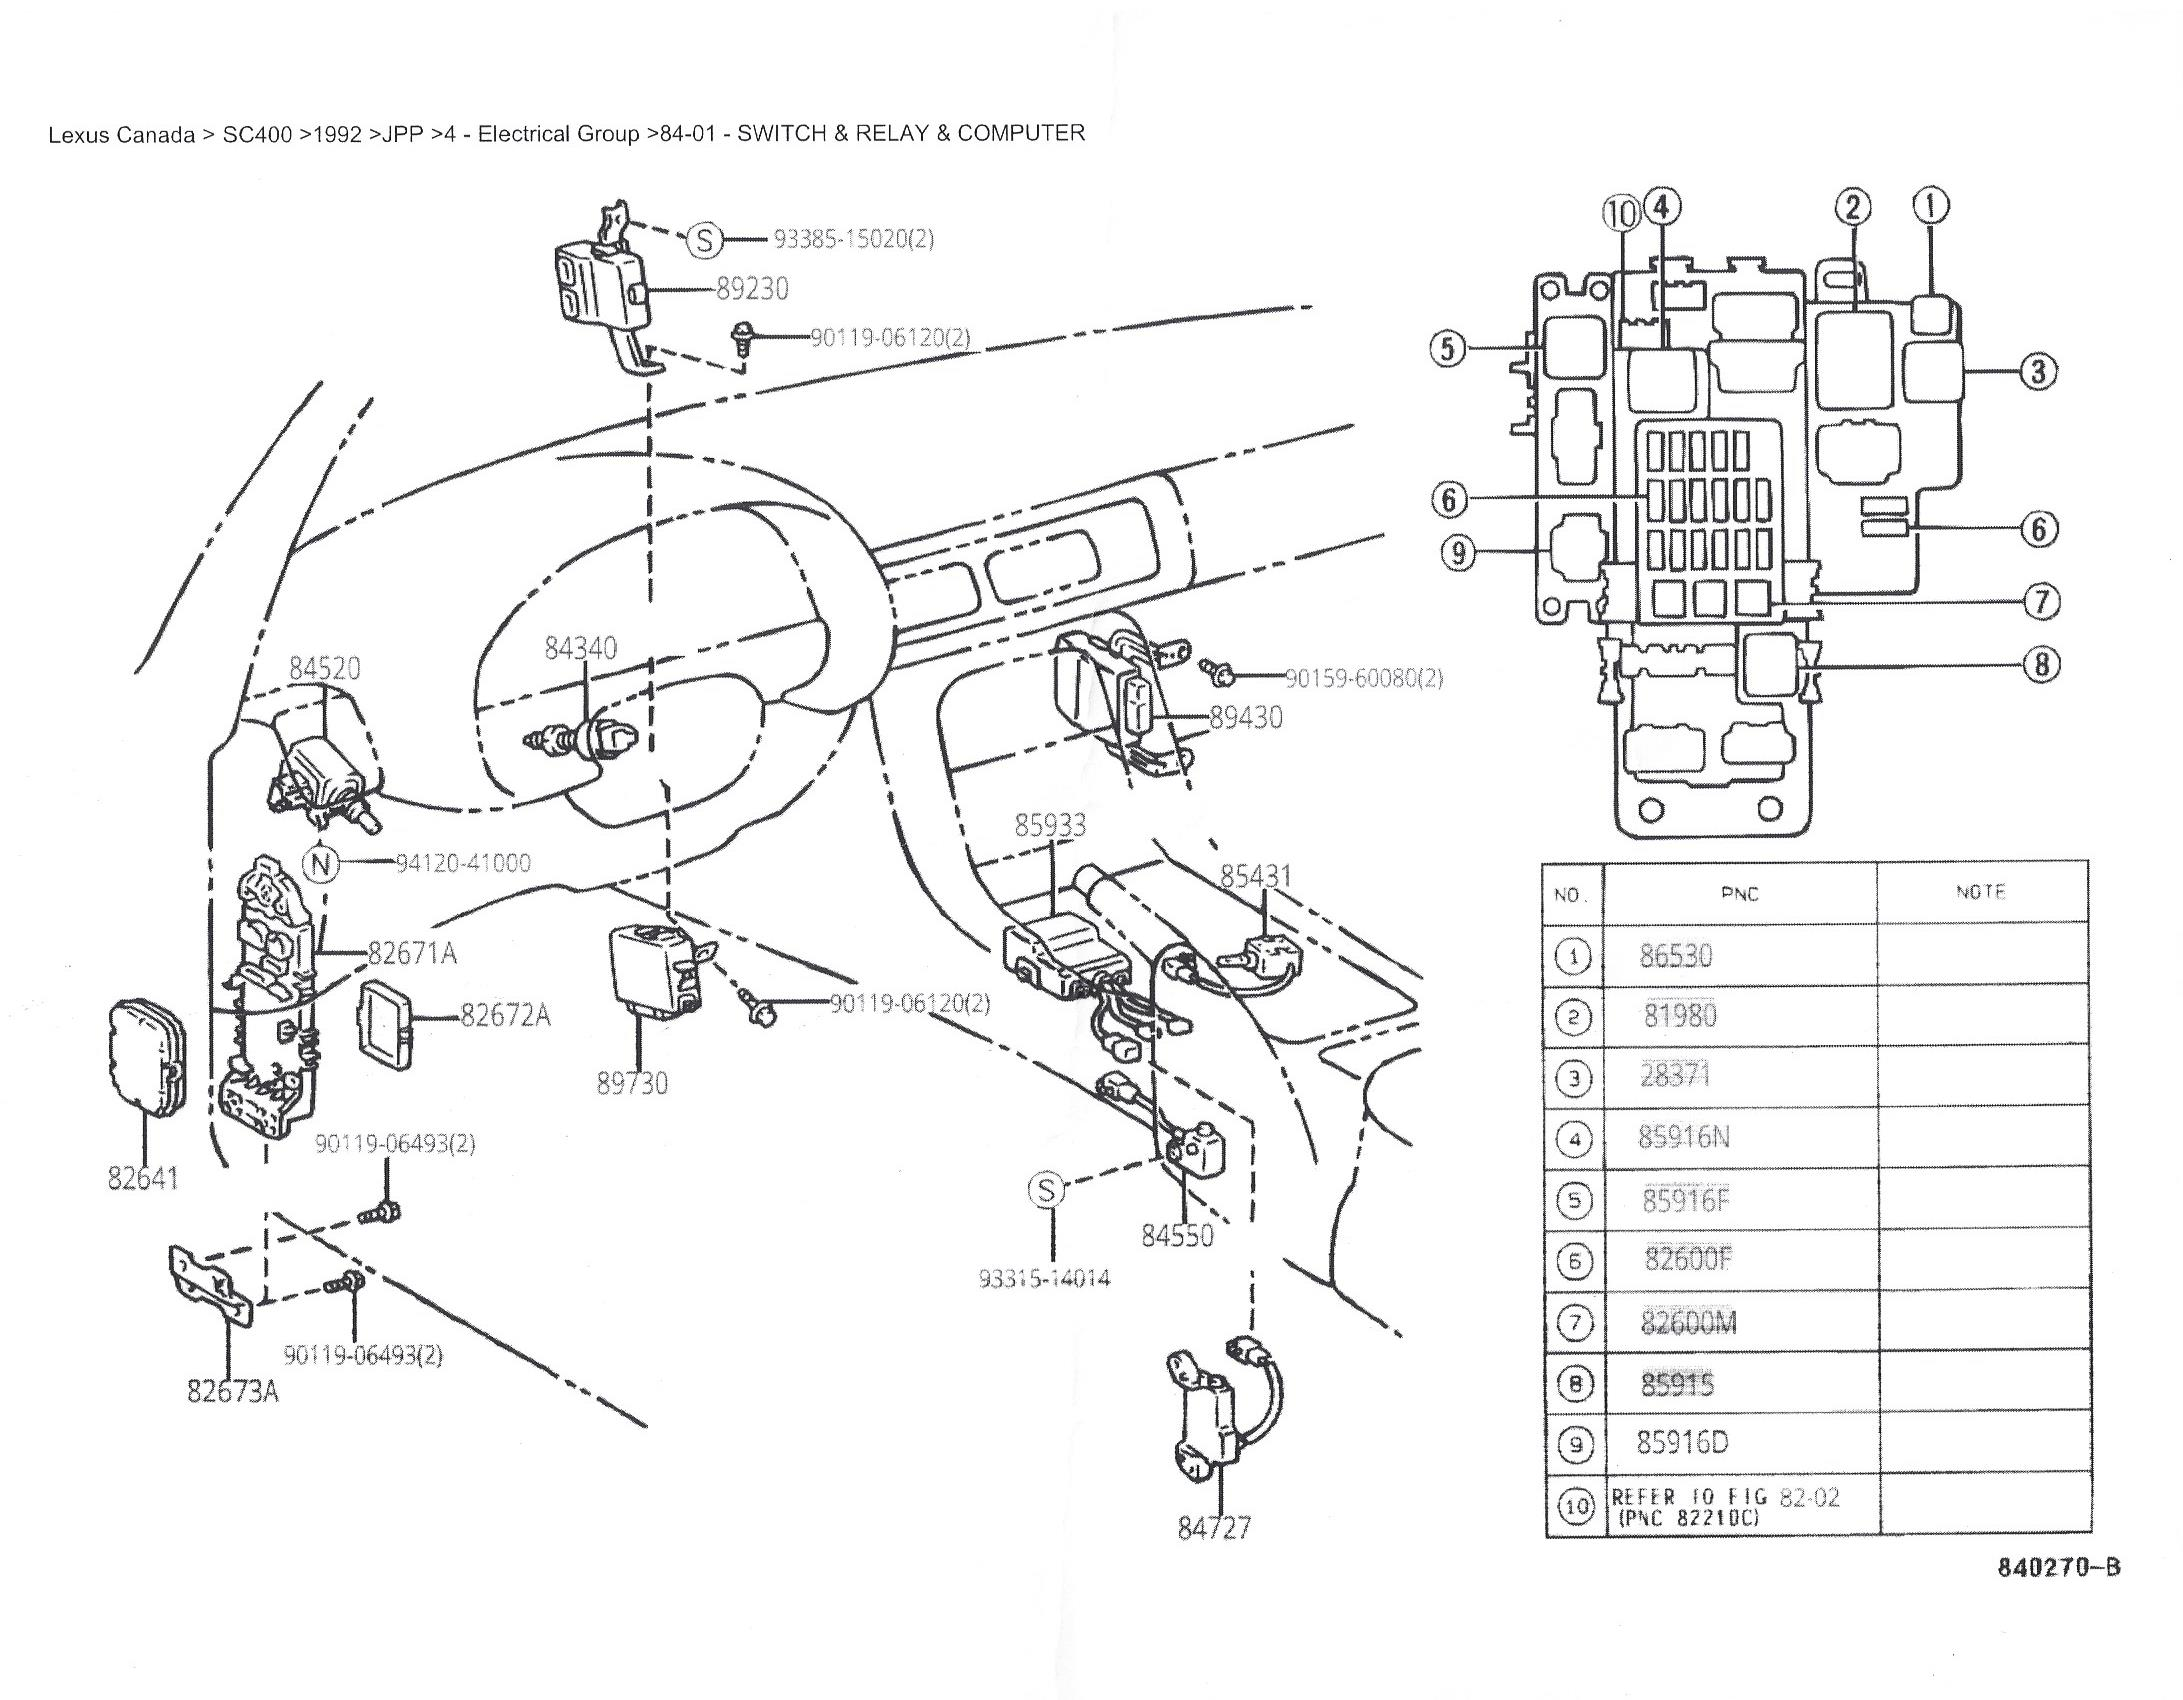 Wiring Diagram Lexus Lfa - Wiring Diagrams List